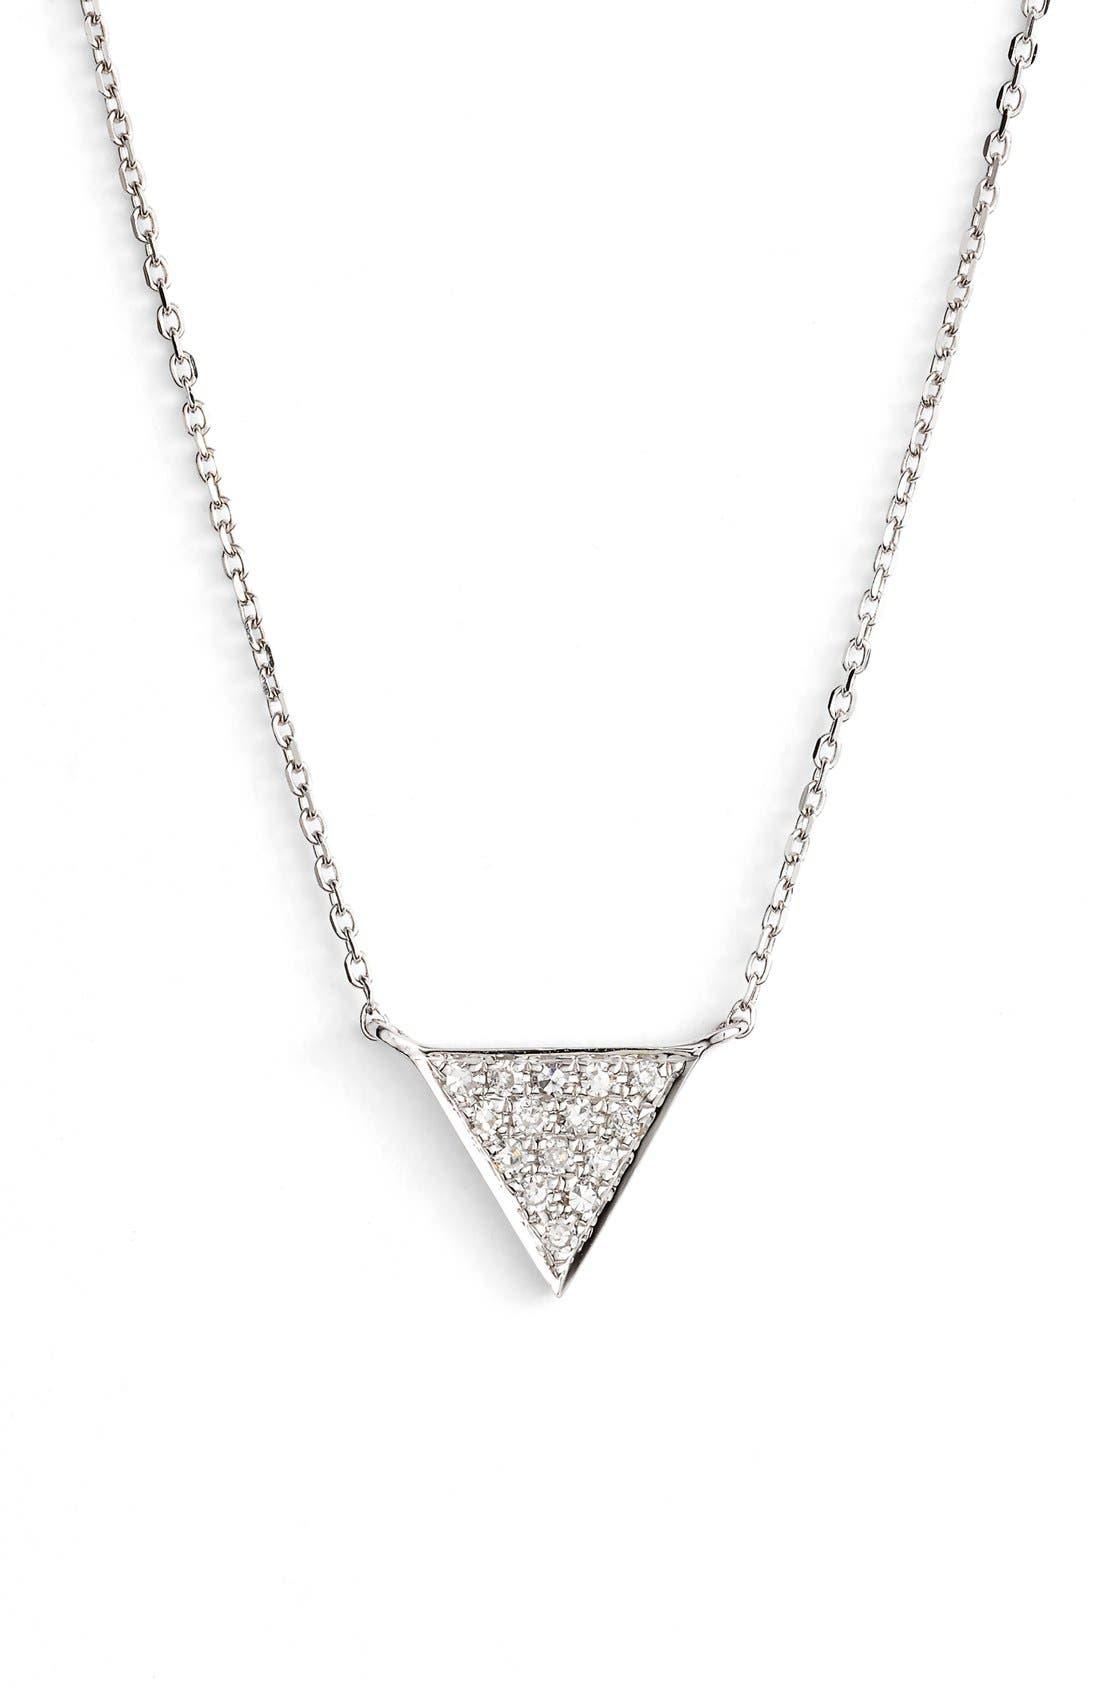 Dana Rebecca Designs 'Emily Sarah' Diamond Triangle Pendant Necklace